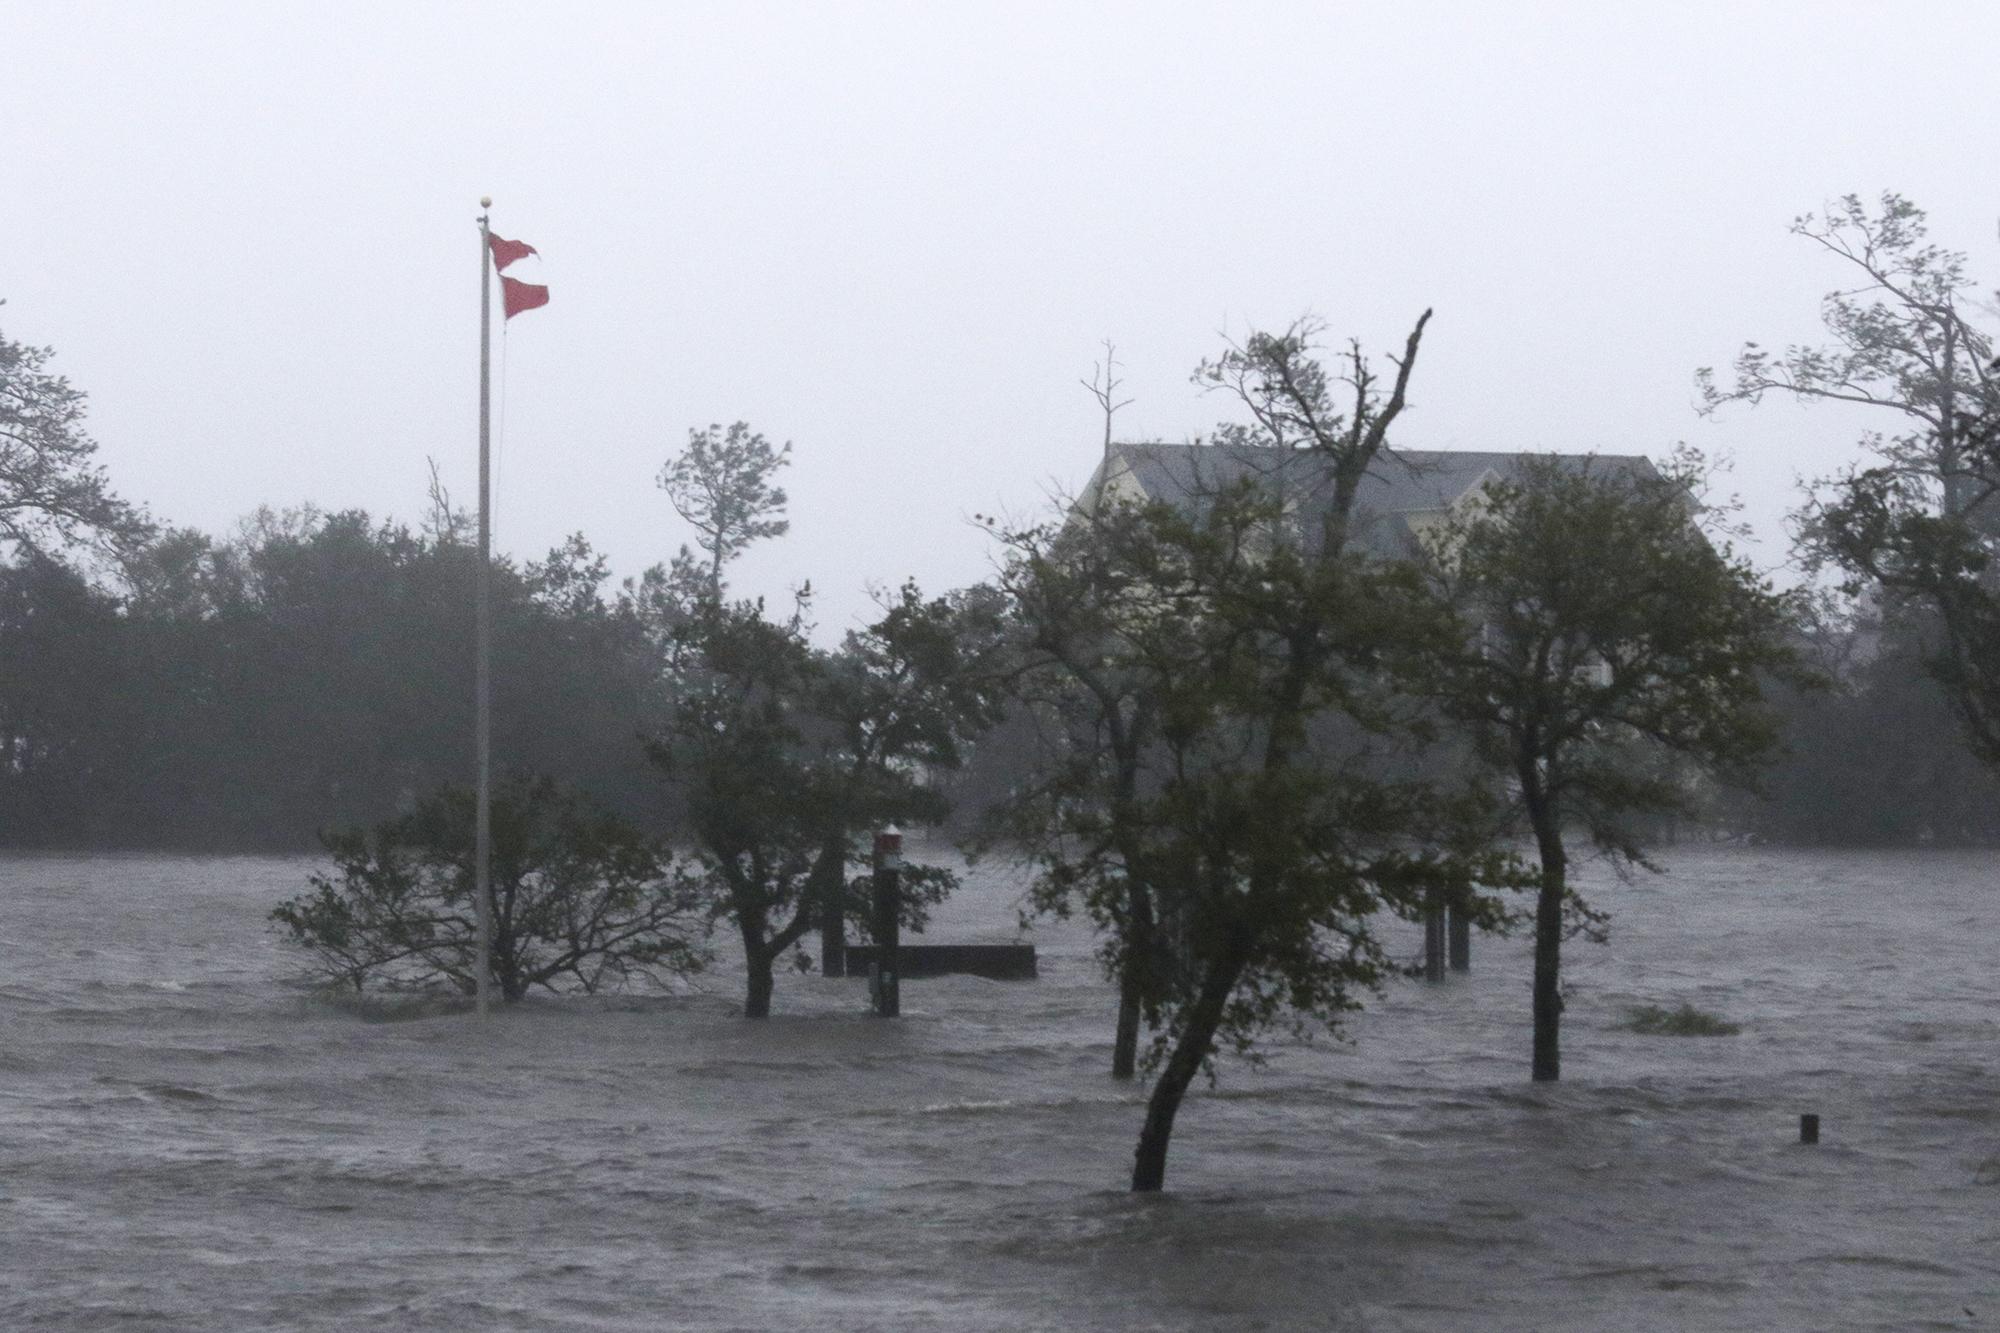 APTOPIX_Tropical_Weather_North_Carolina_13107-159532.jpg72106747